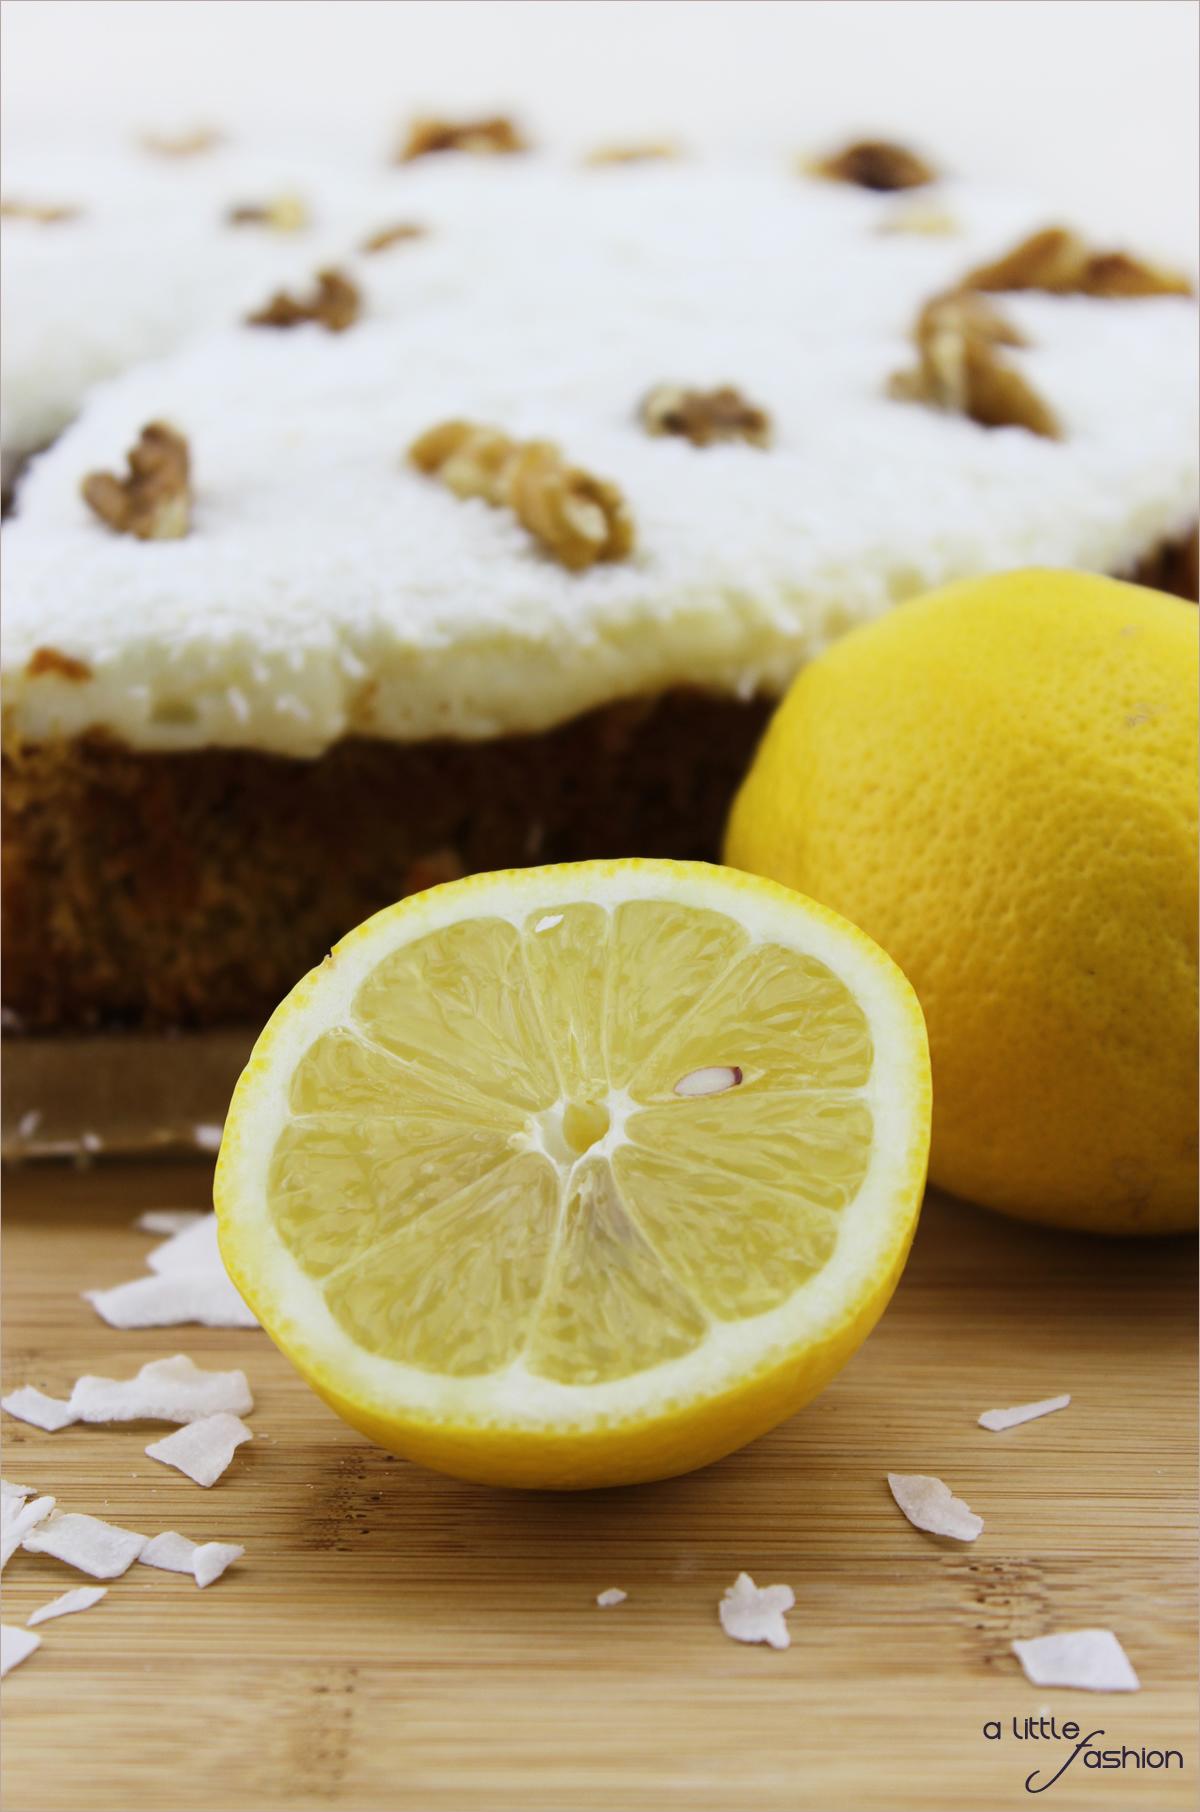 Möhren-Walnuss-Torte mit Zitronentopping | A Little Fashion |